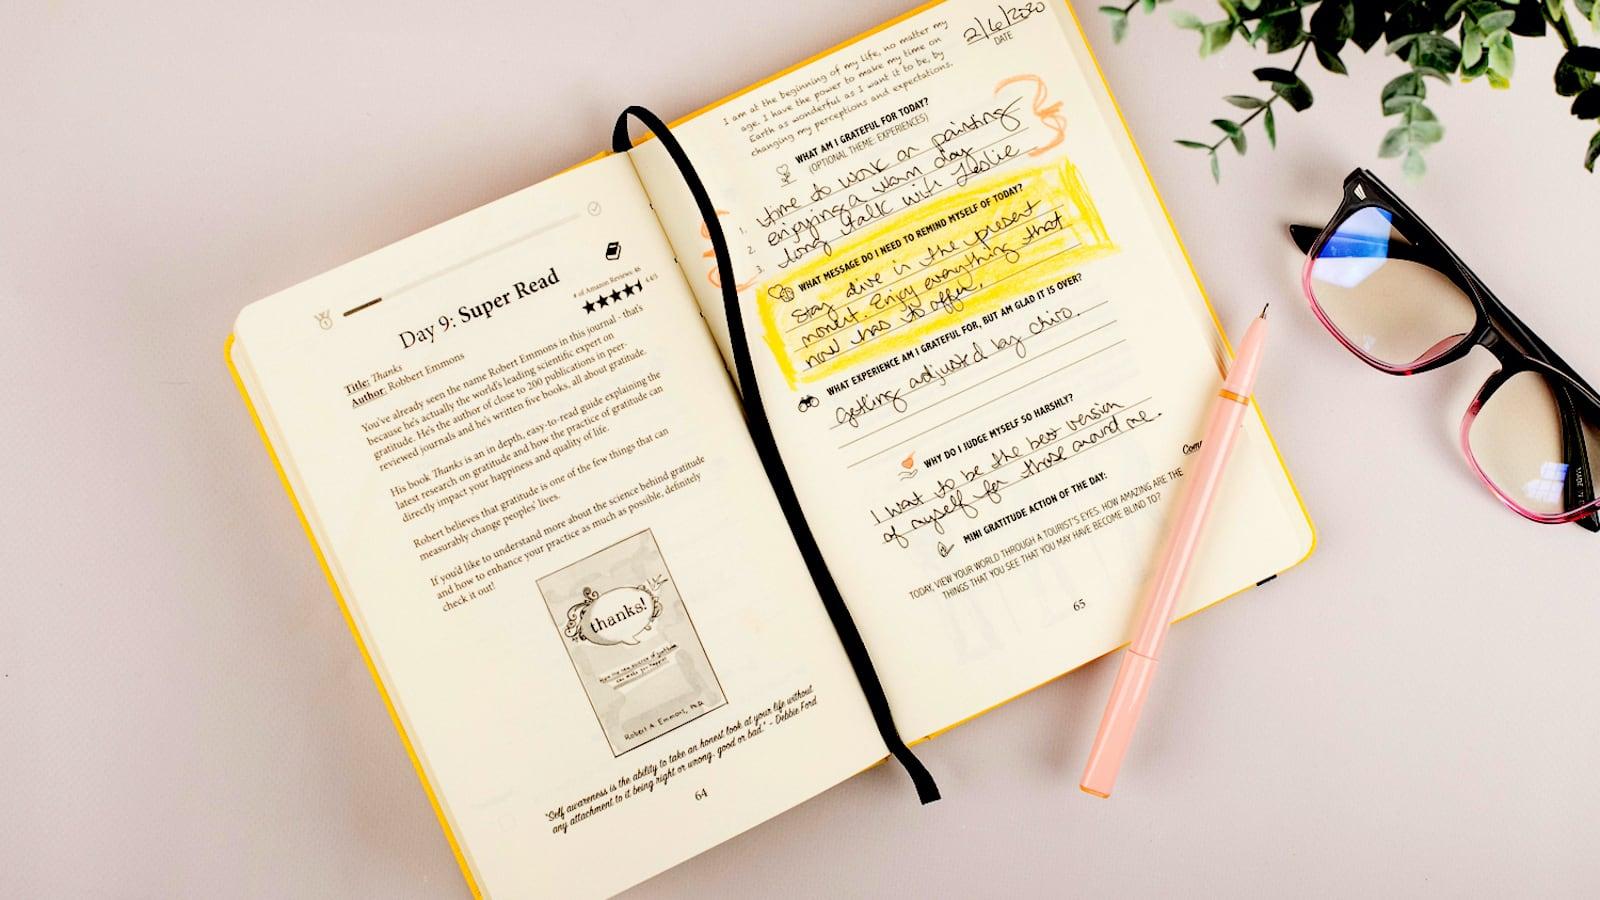 Gratitude Sidekick Journal Guided Appreciation Notebook